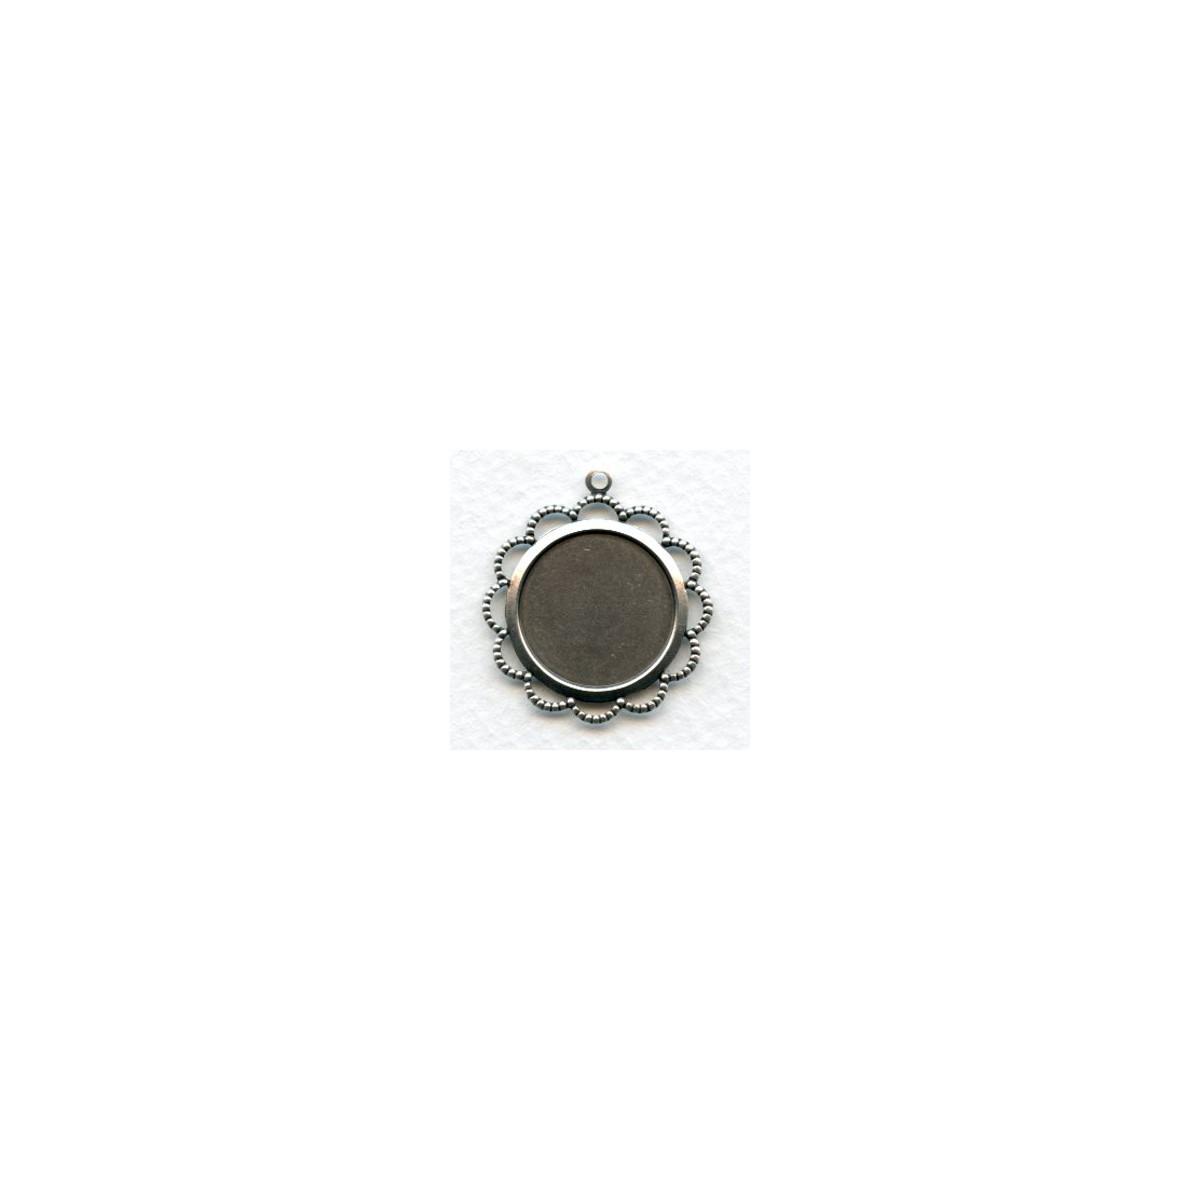 Filigree Edge 18mm Setting Oxidized Silver (6)